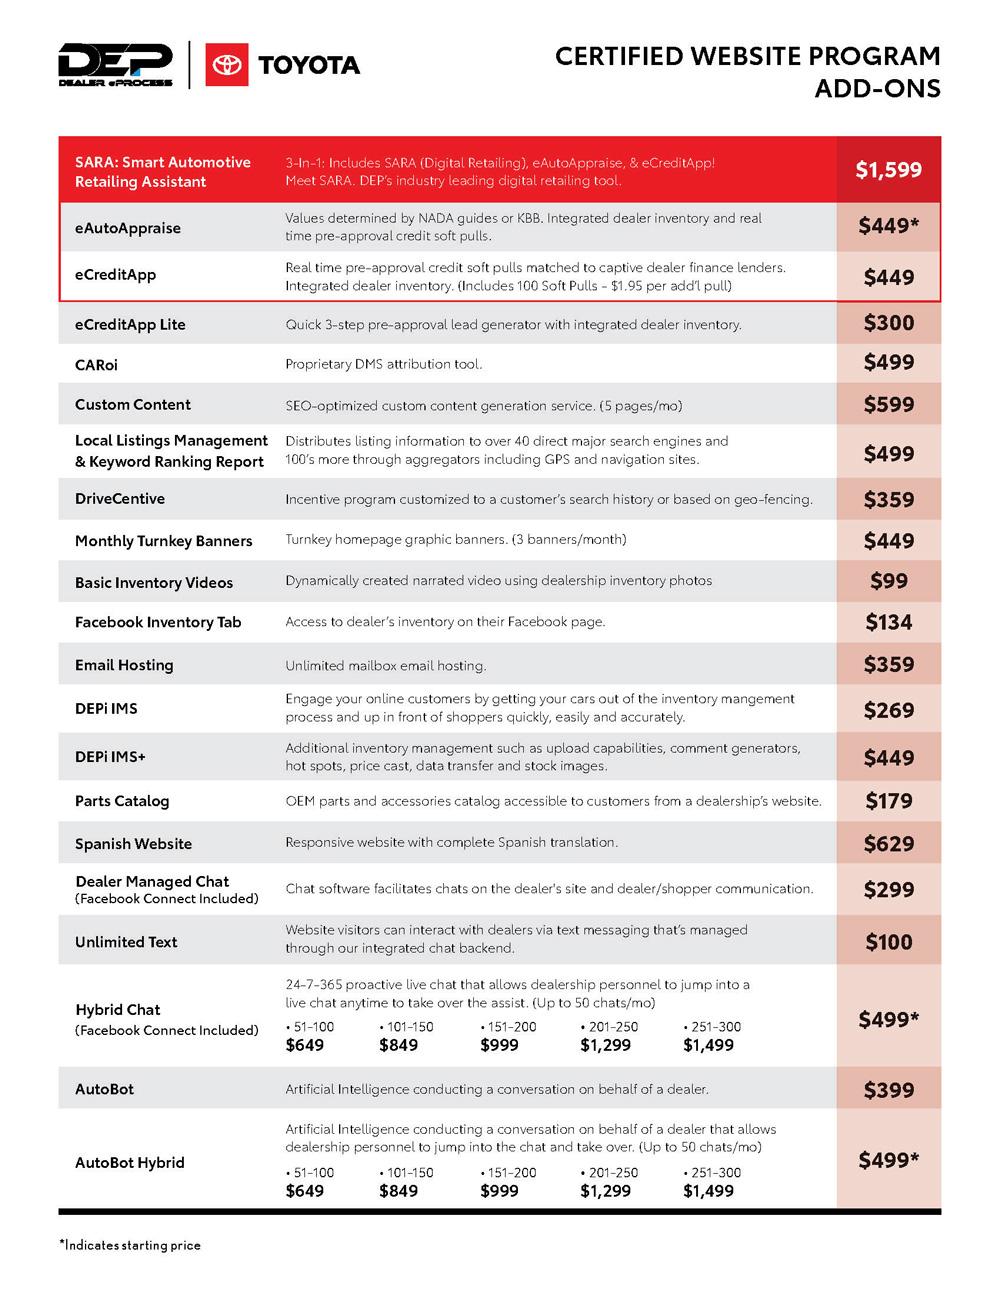 Toyota Website Program Add Ons price sheet